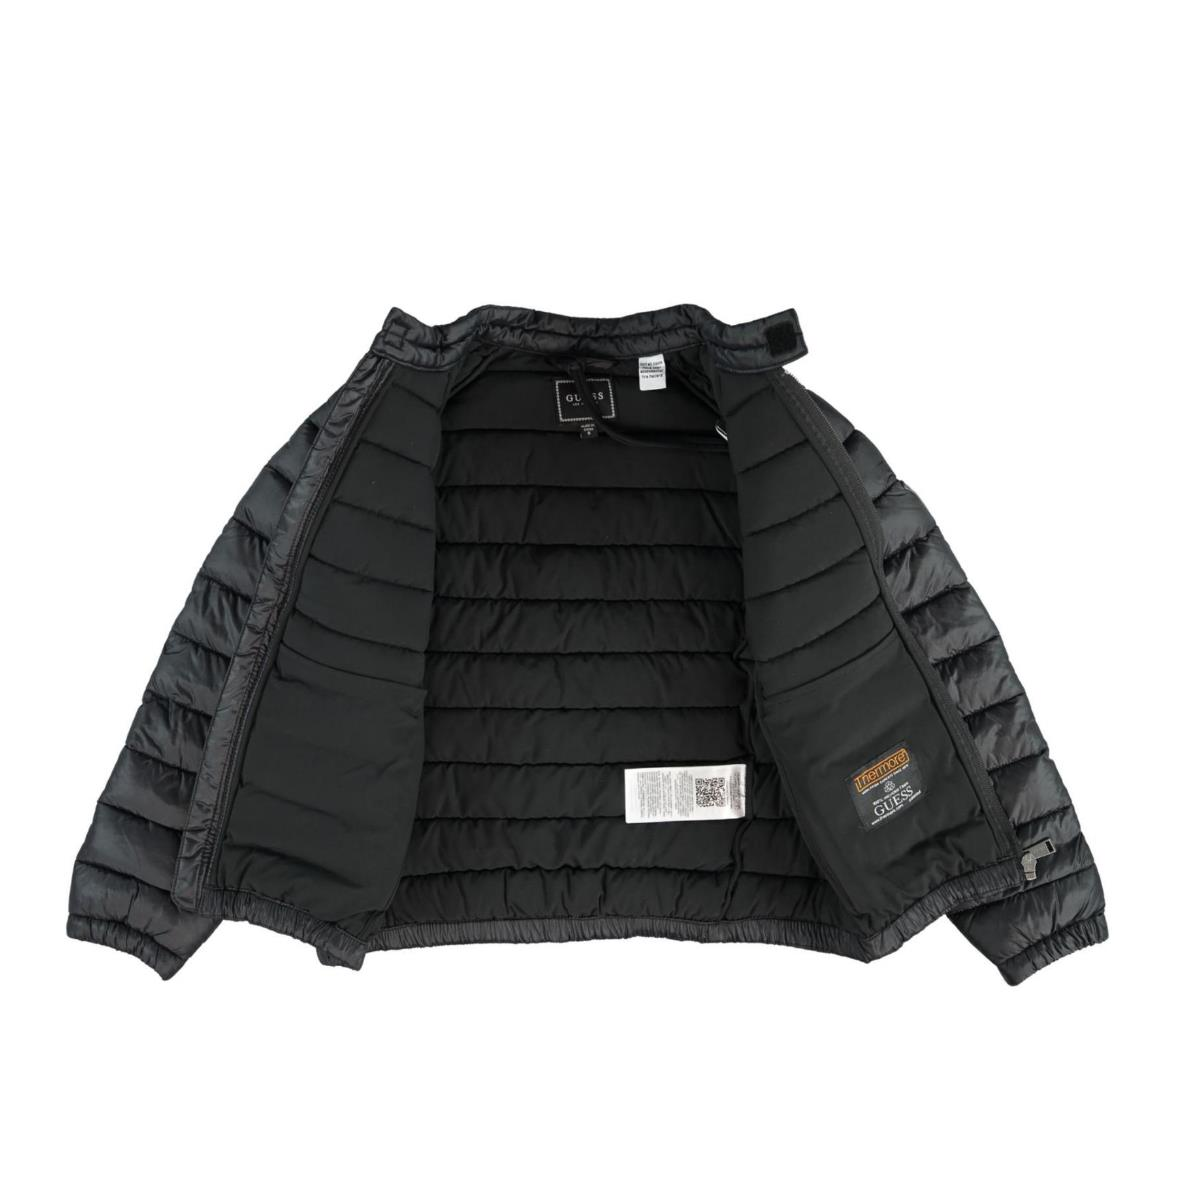 timeless design a04ef 2a997 Piumino Bomber Nero Guess Da Bambino|Shop Special Pricecs